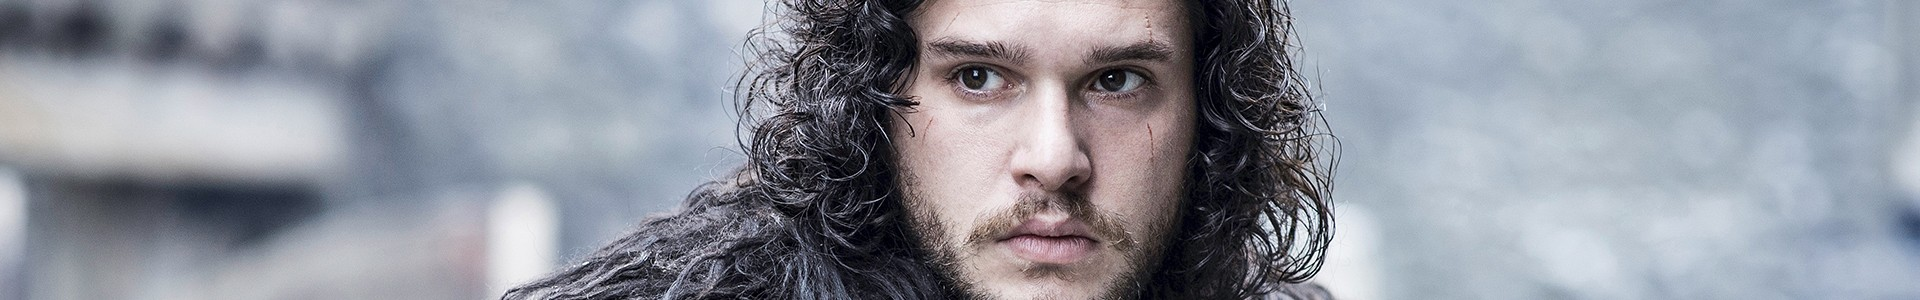 Qual o nome verdadeiro de Jon Snow de Game of Thrones?